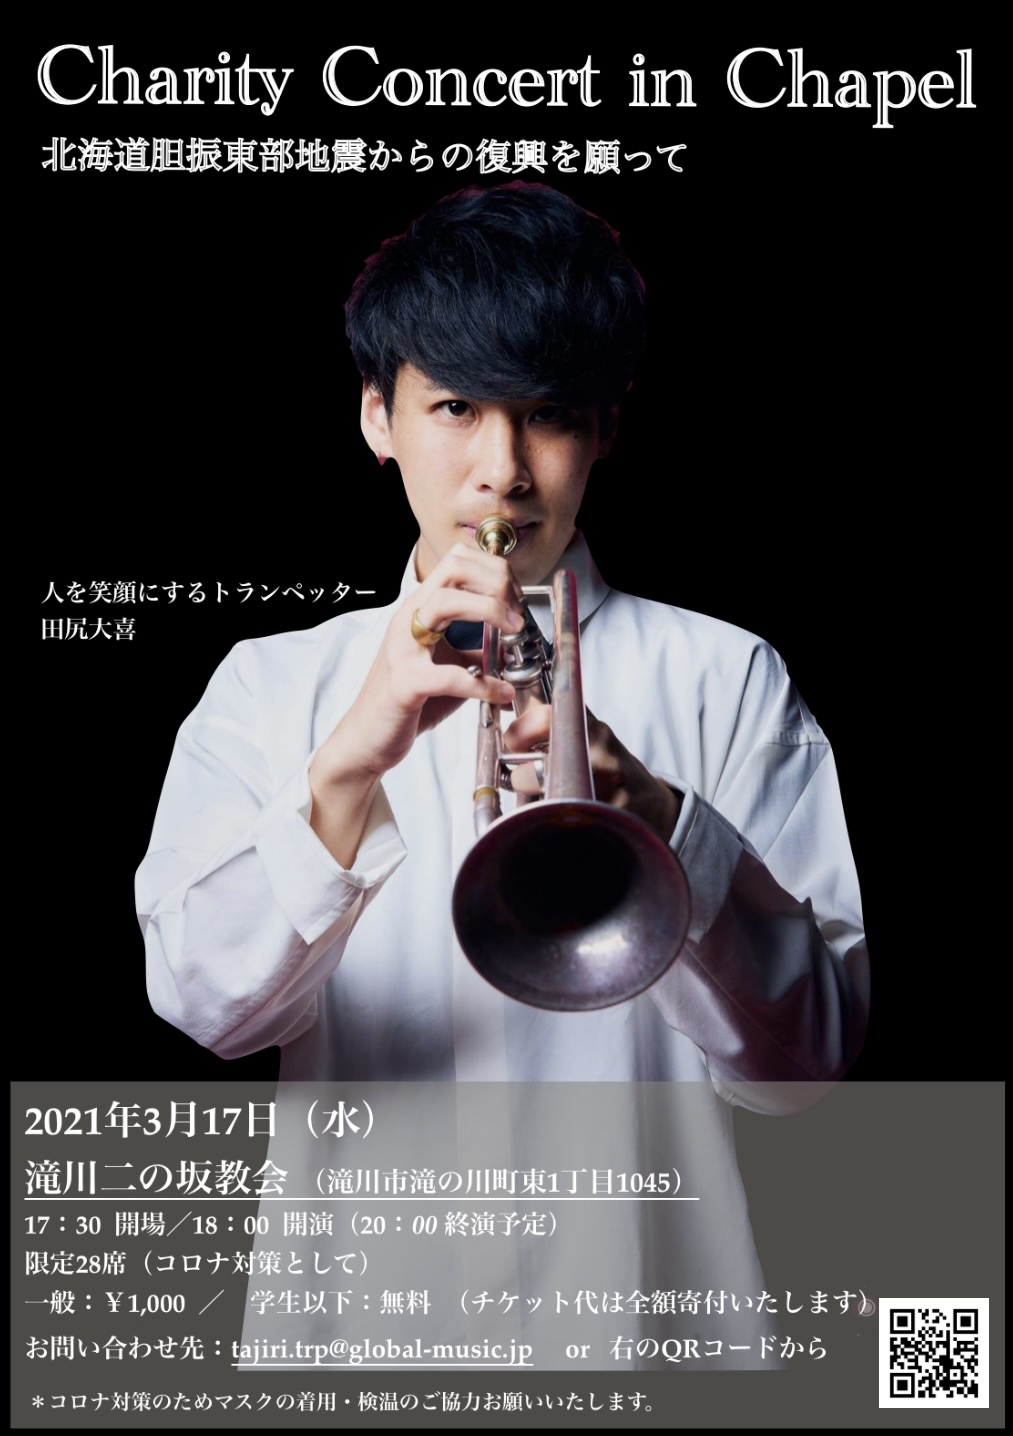 Charity Concert in Chapel 北海道胆振東部地震からの復興を願って